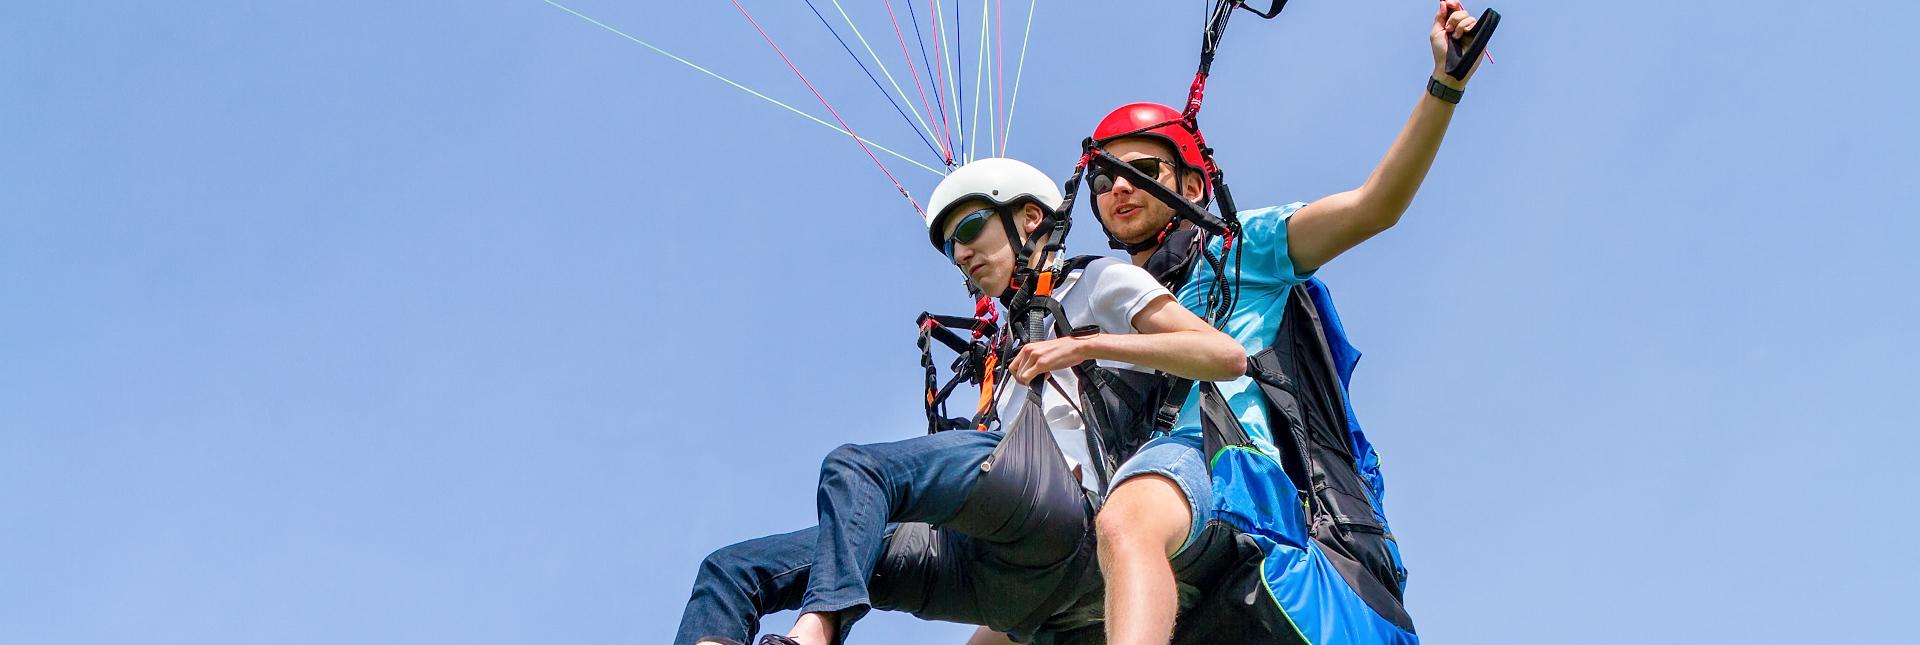 Paragliding above Chamonix